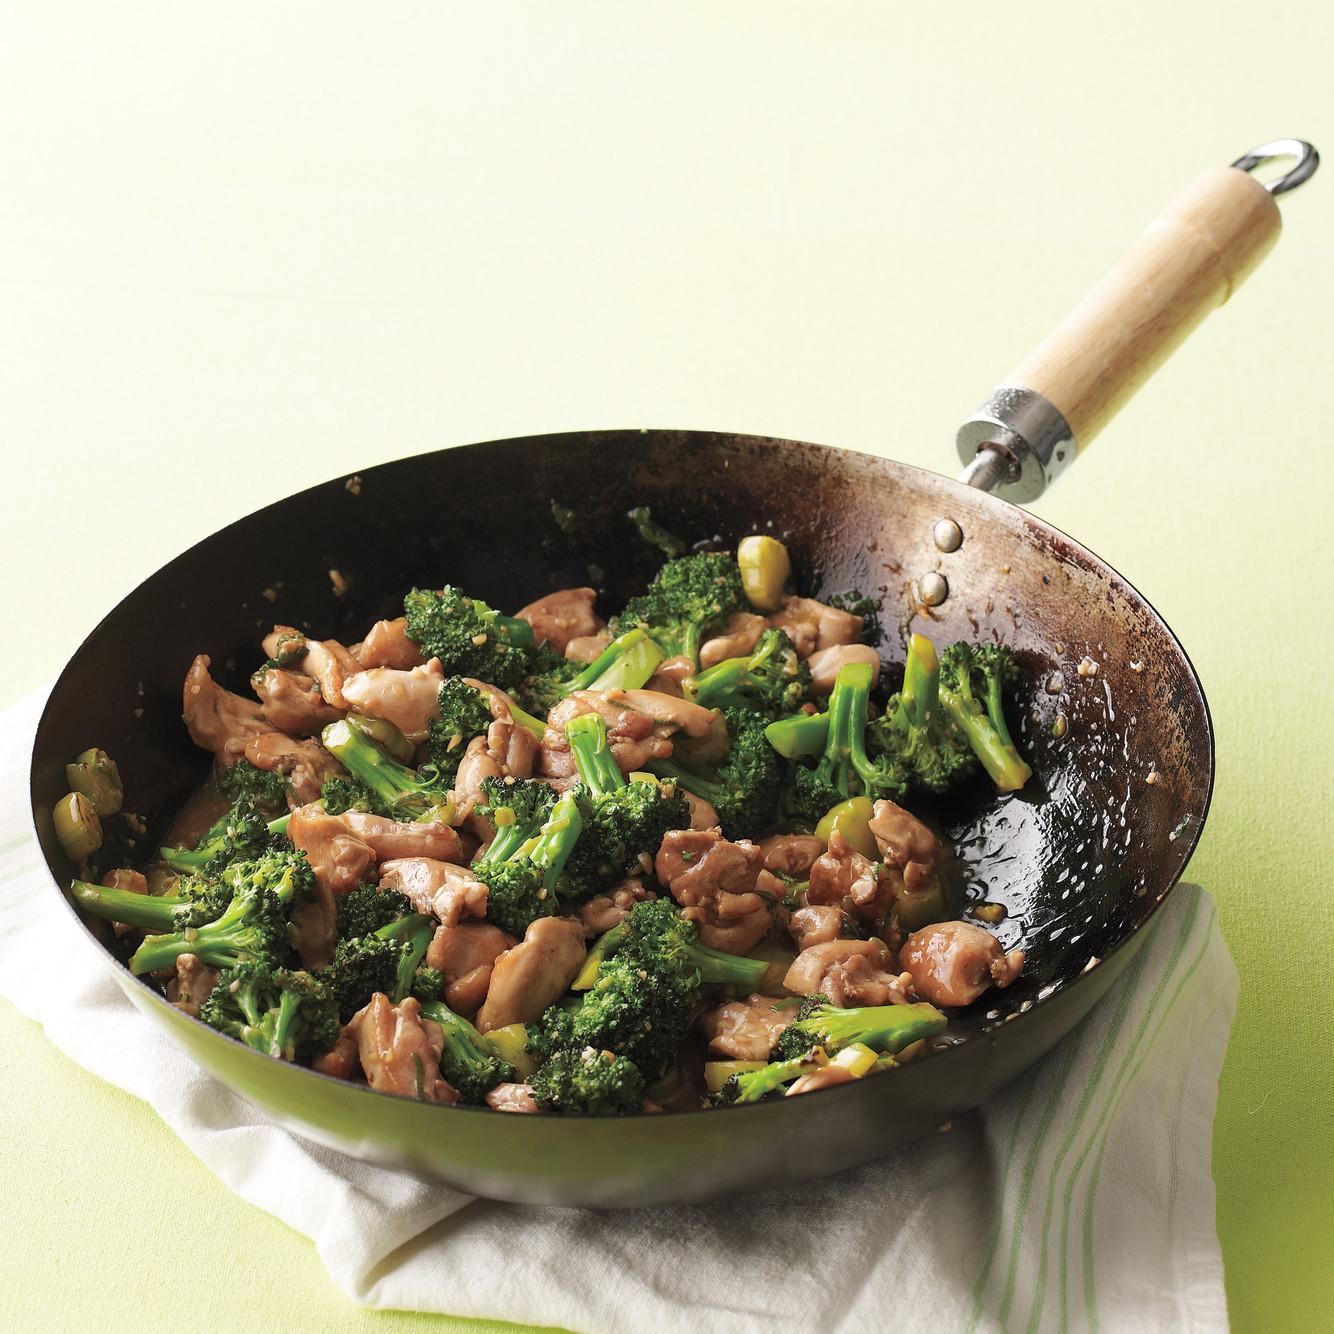 Chicken-And-Broccoli Stir-Fry-2397